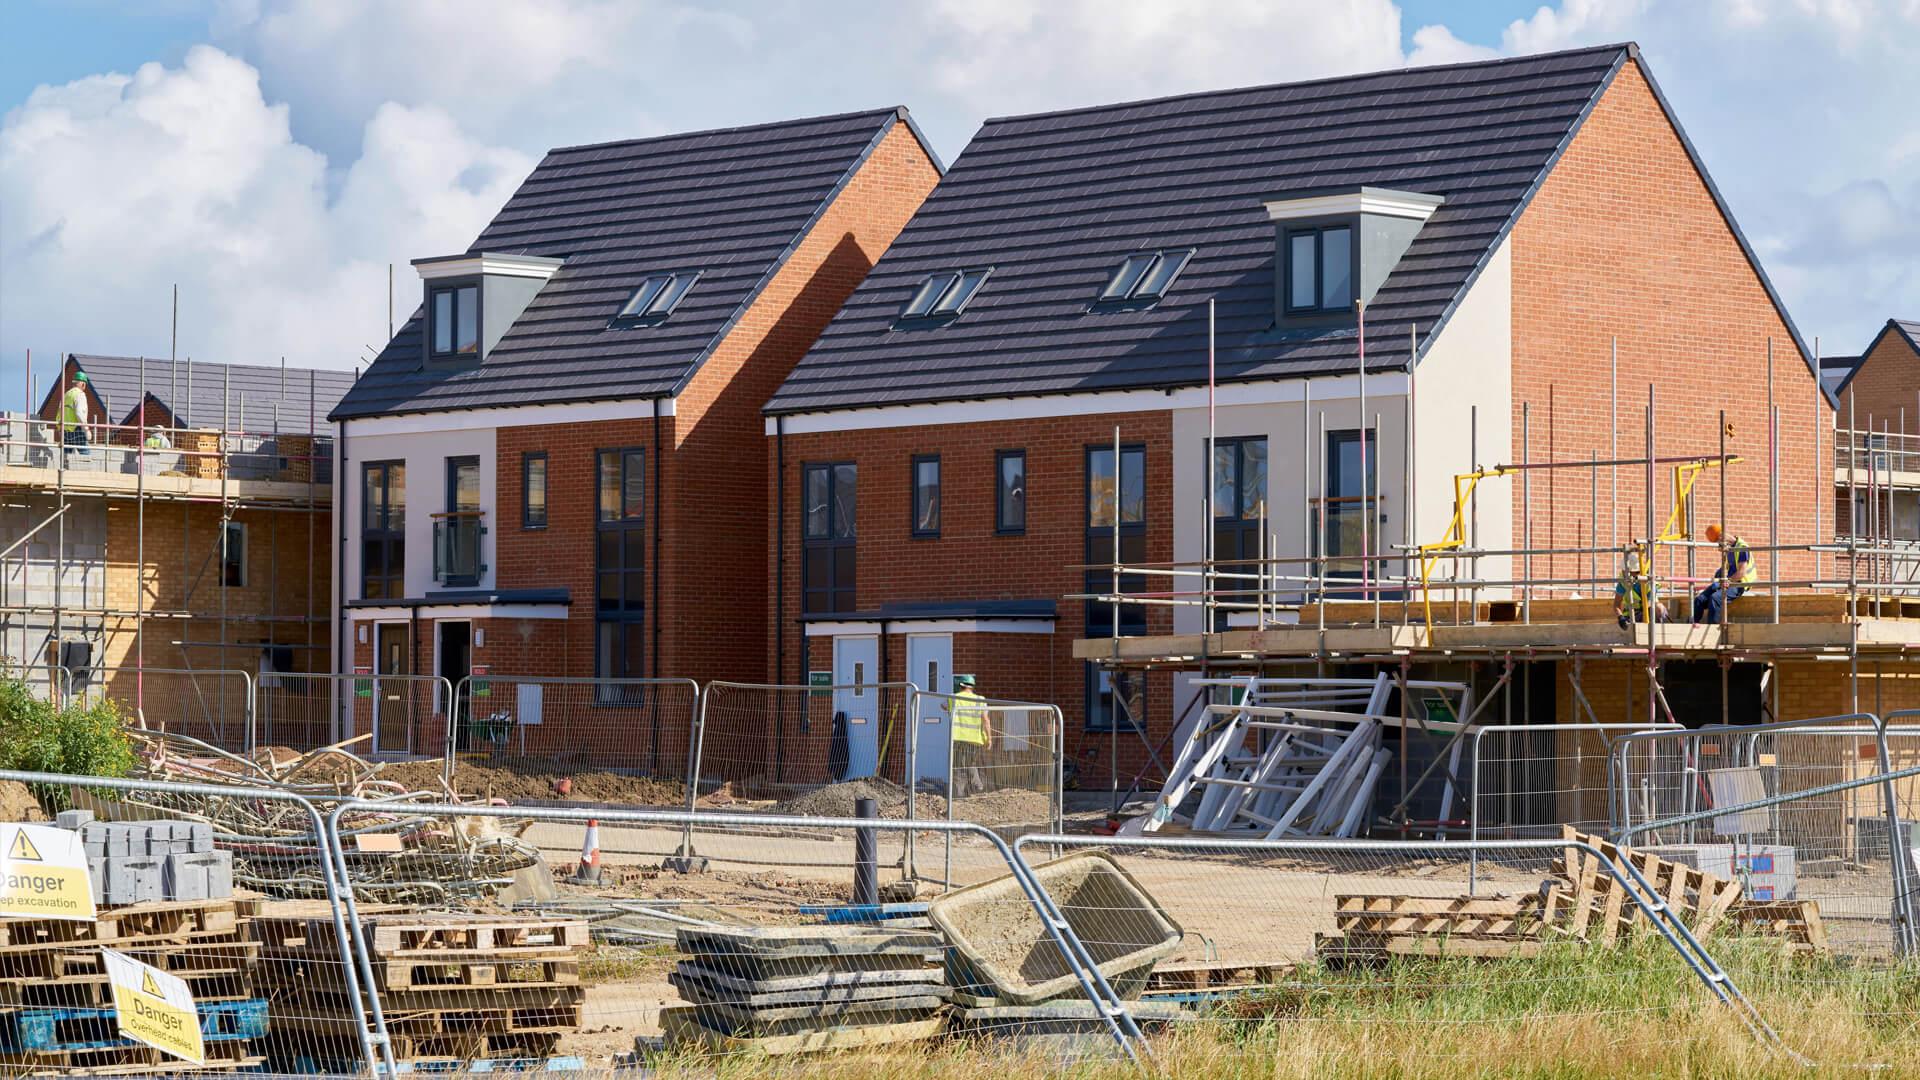 House developments